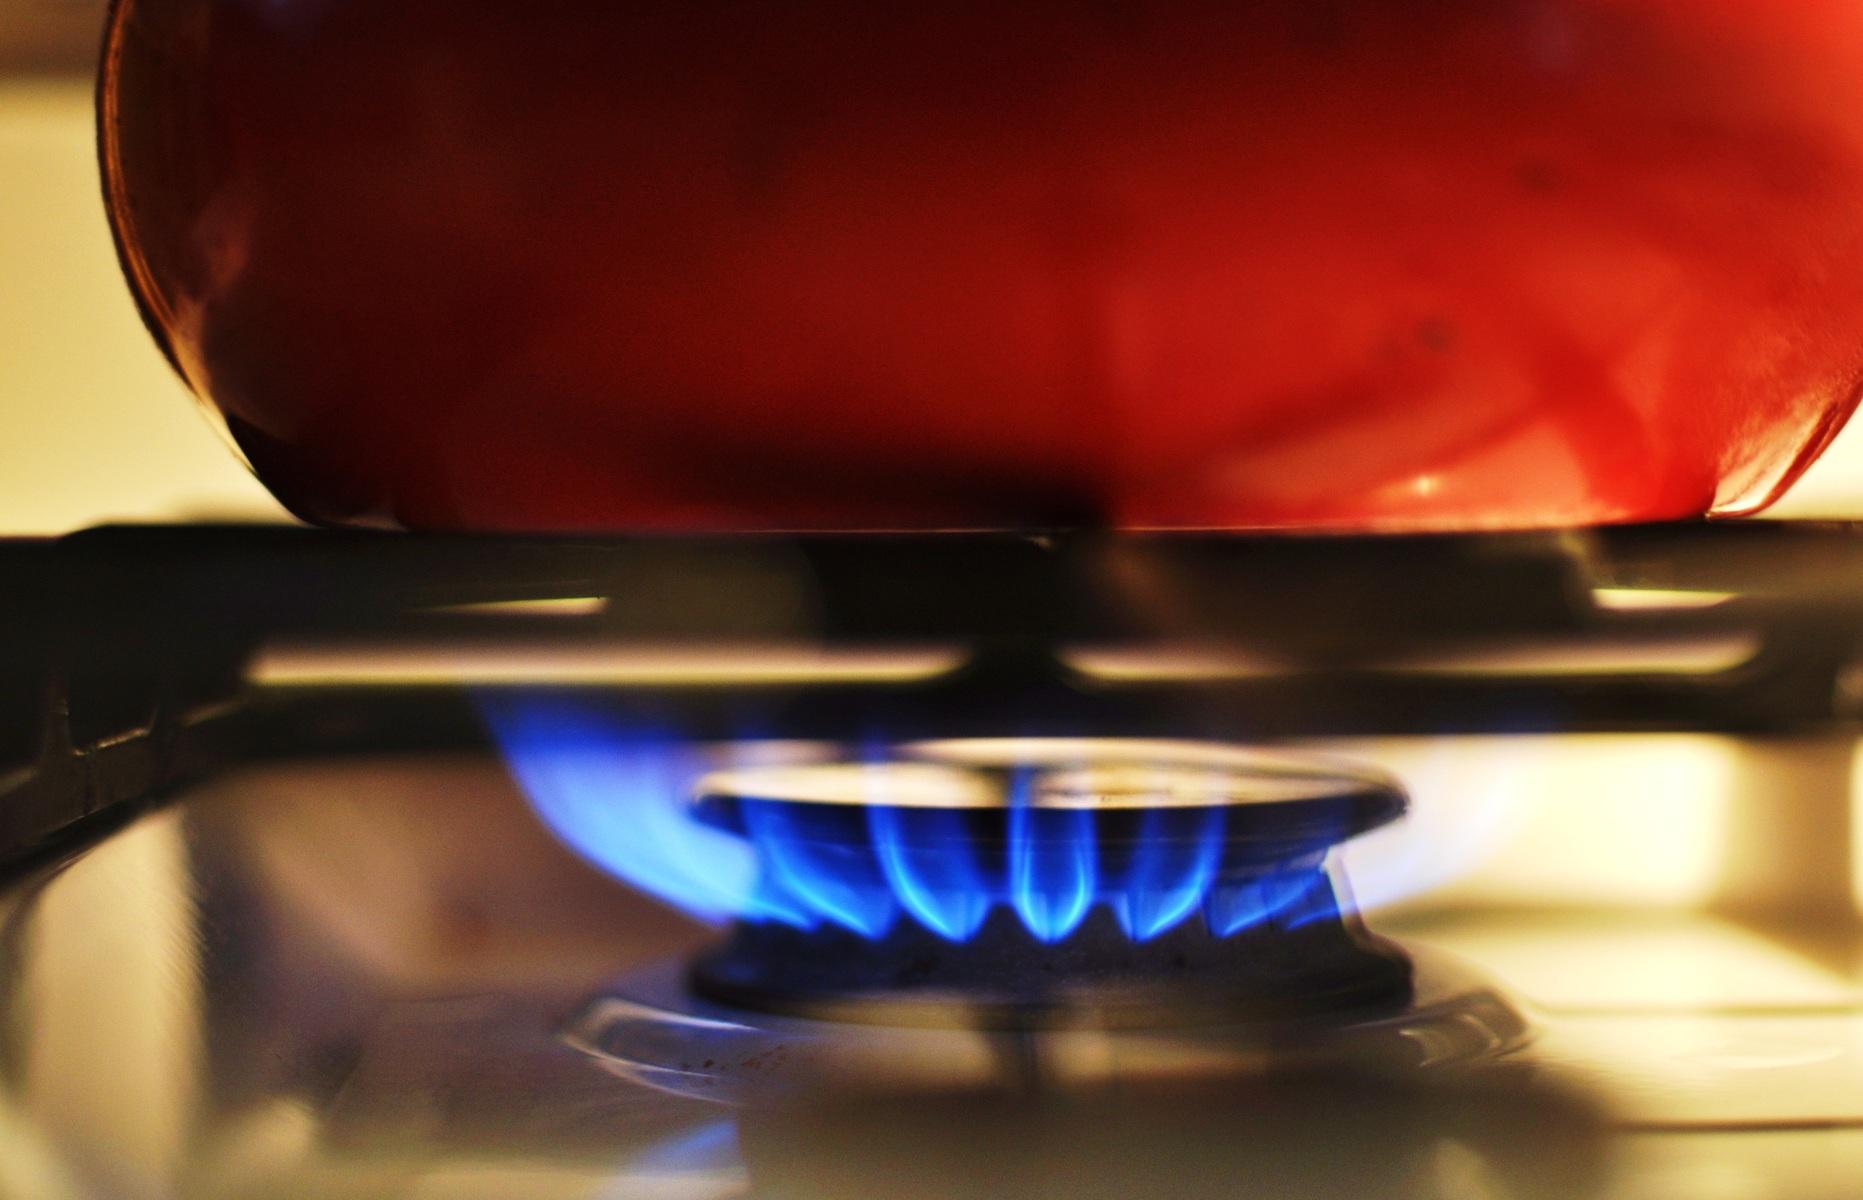 https://www.fl-impianti.it/wp-content/uploads/2021/01/Impianti-Gas-Metano.jpg